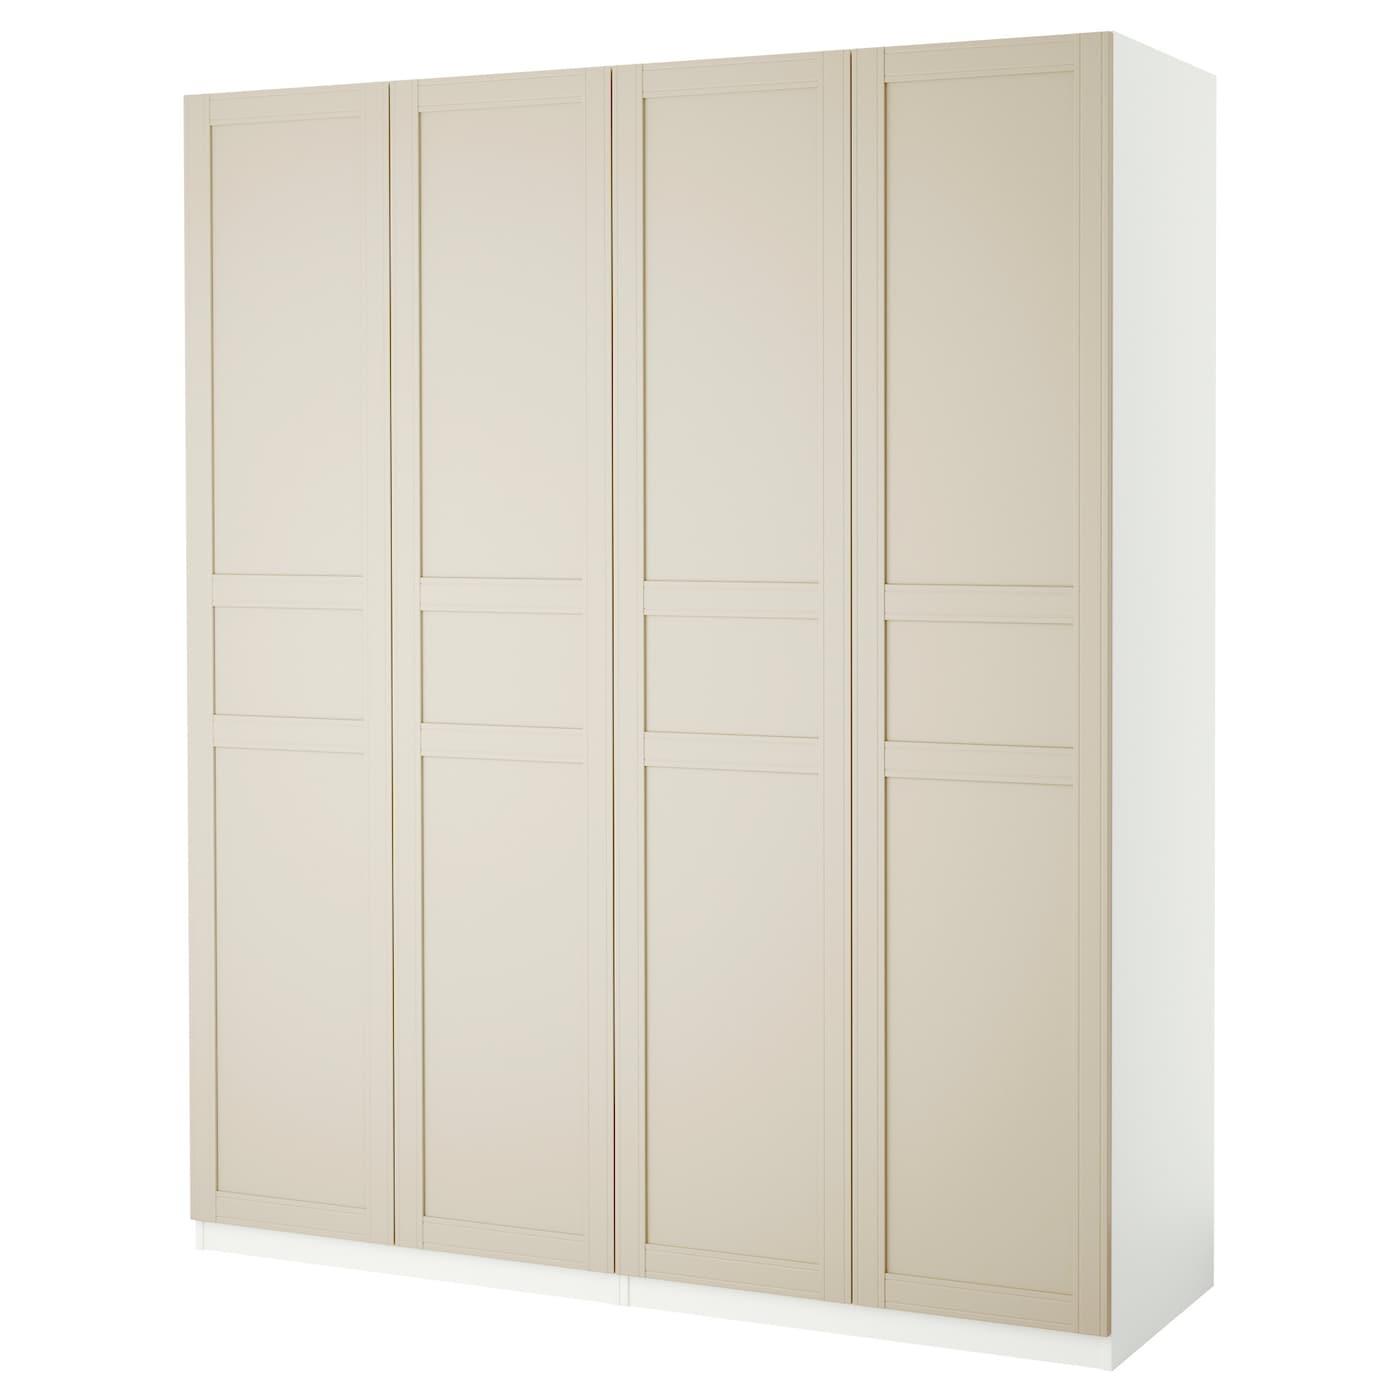 pax wardrobe white flisberget light beige 200x60x236 cm ikea. Black Bedroom Furniture Sets. Home Design Ideas